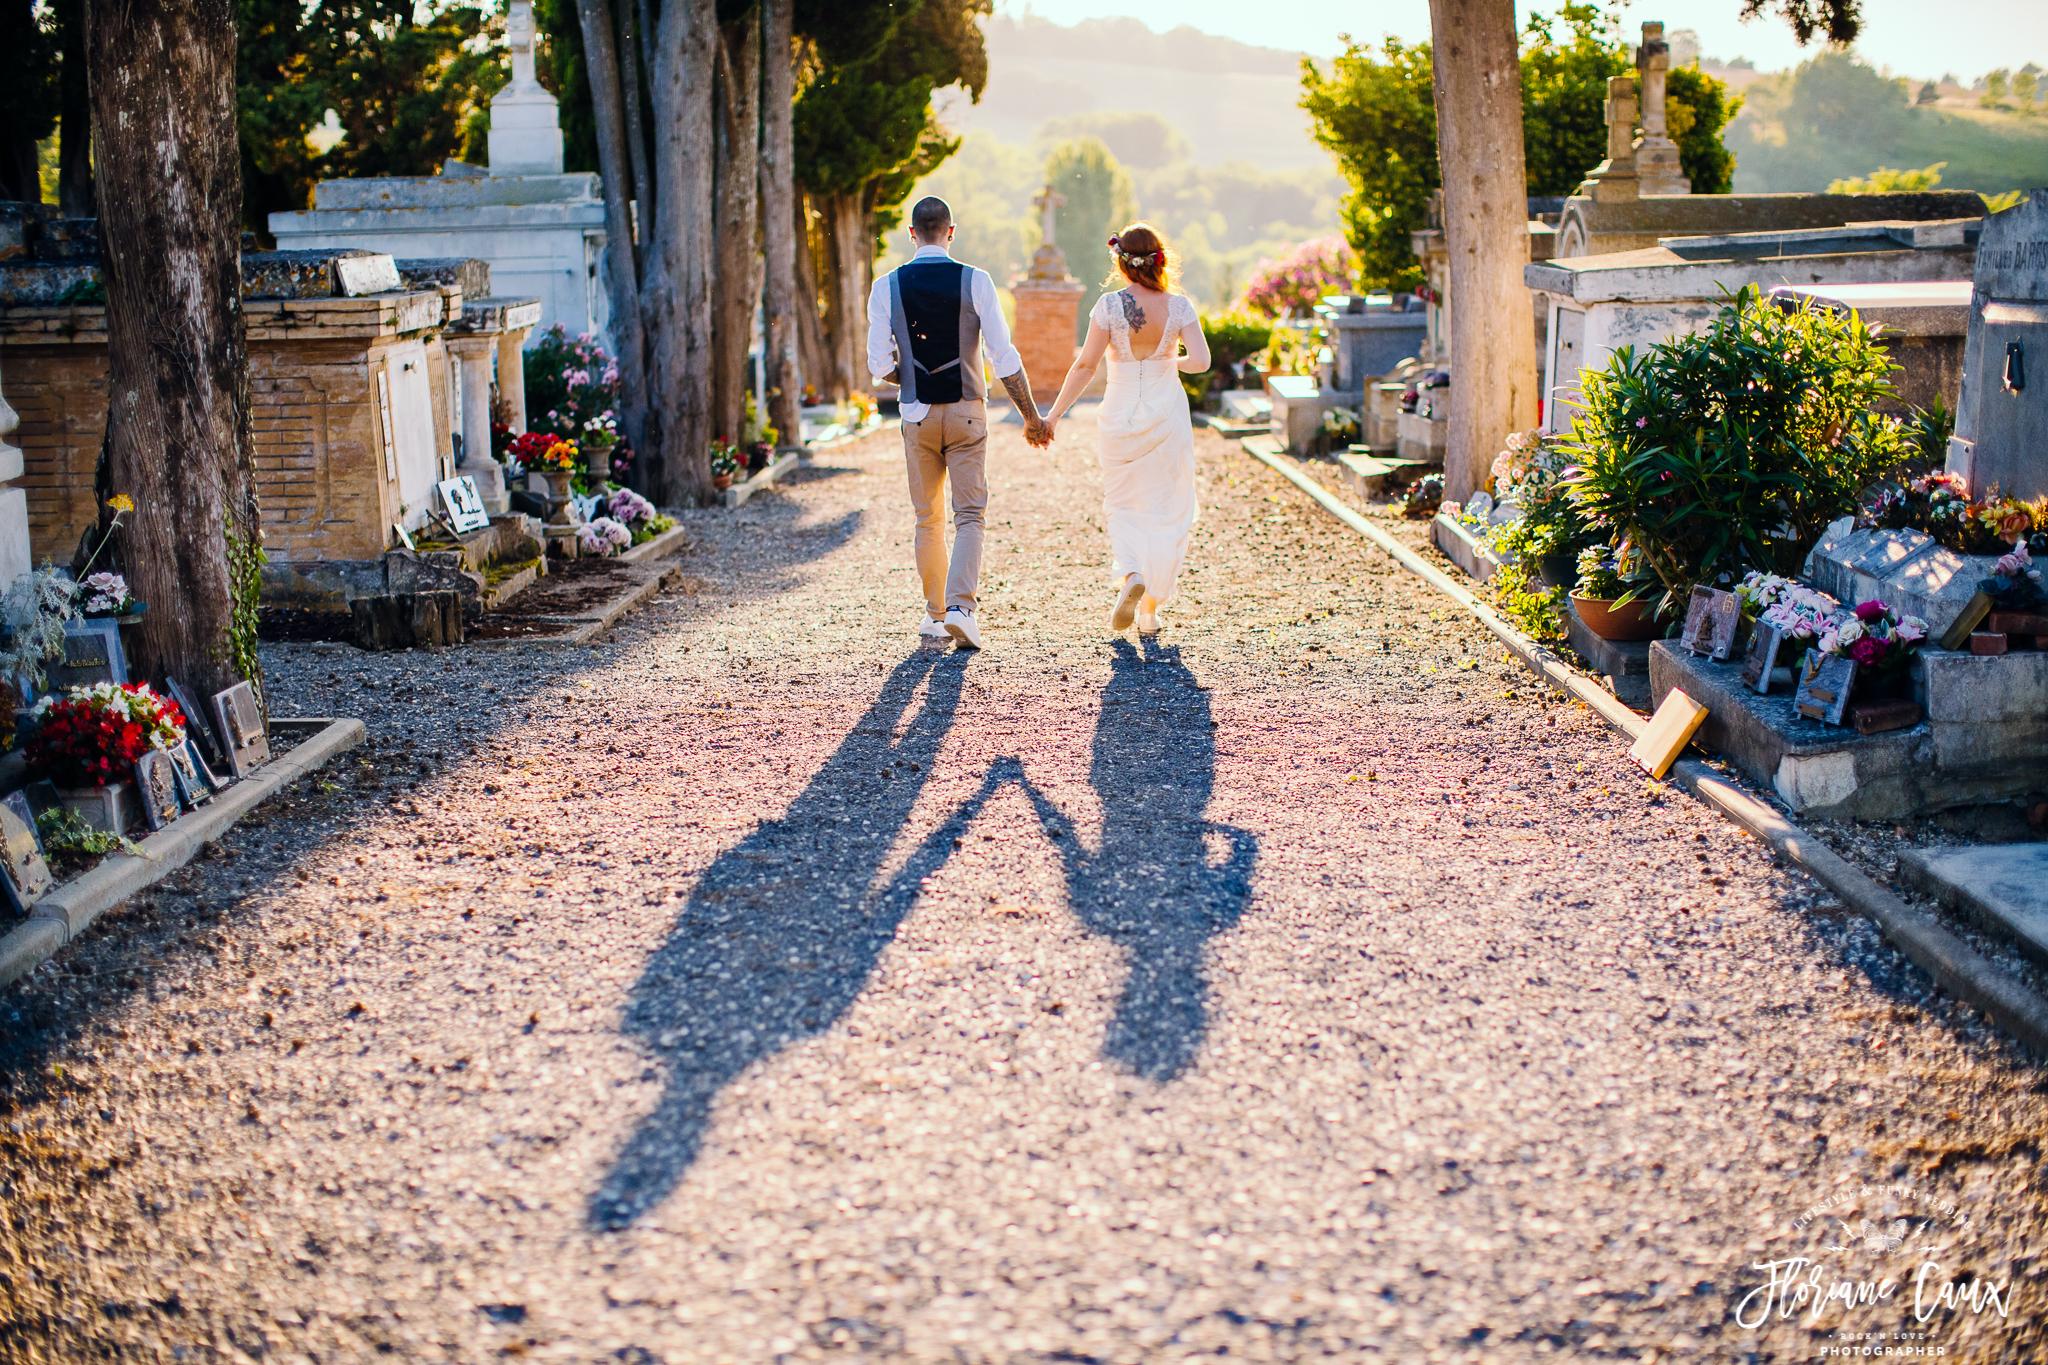 photographe-mariage-toulouse-rocknroll-maries-tatoues-floriane-caux-56